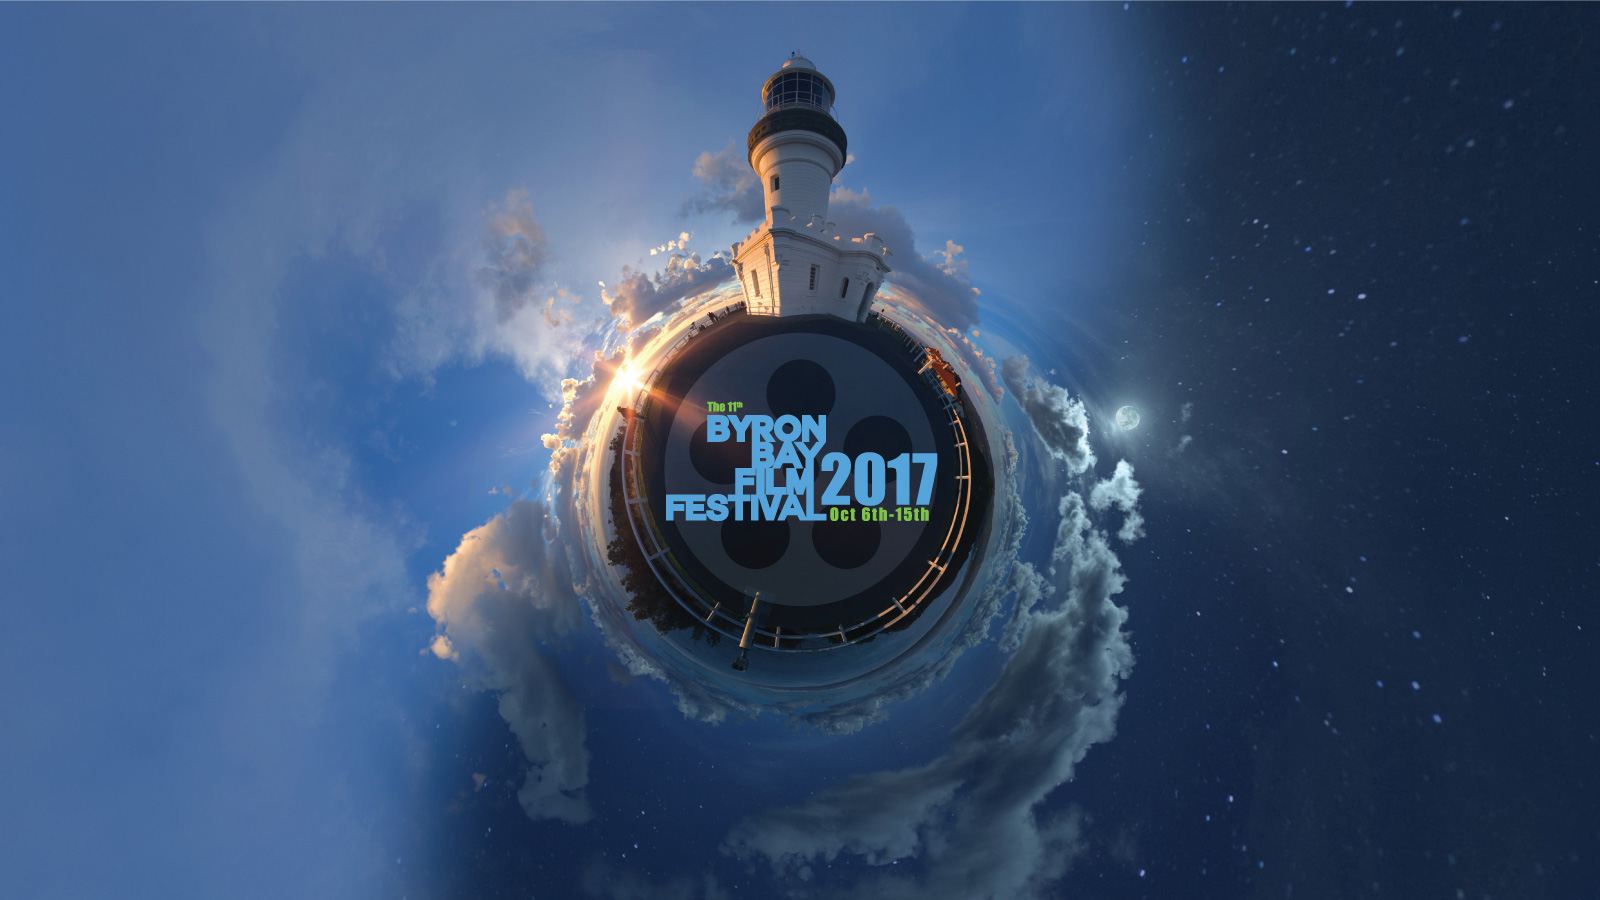 BBFF 2017